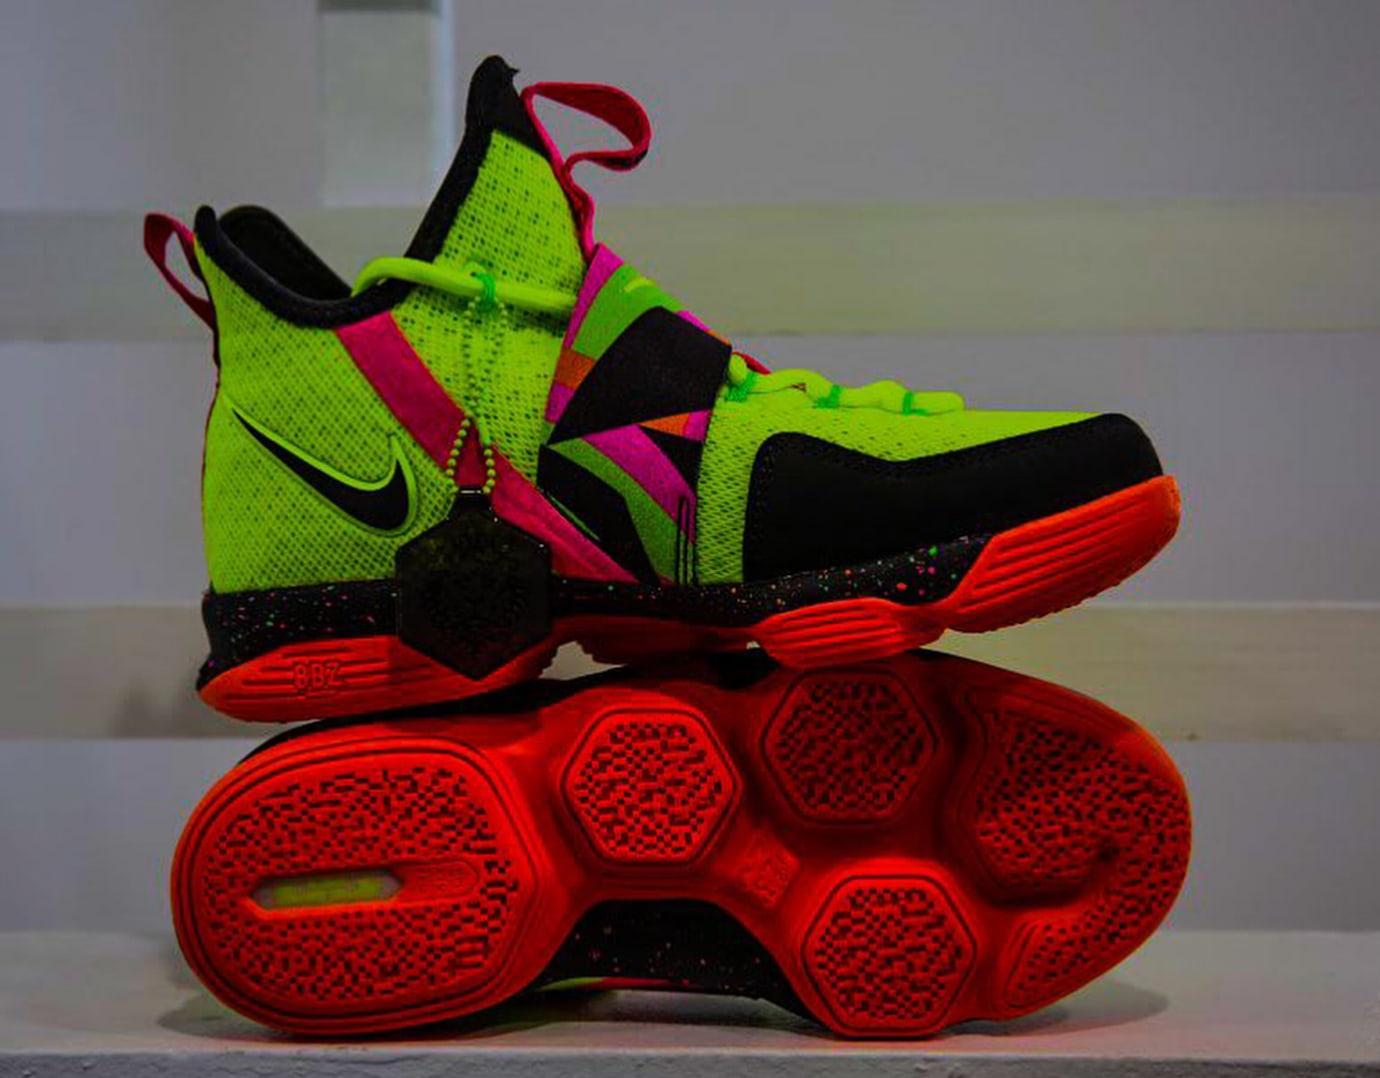 Nike LeBron 14 Ultimate Warrior Profile AA3258-703